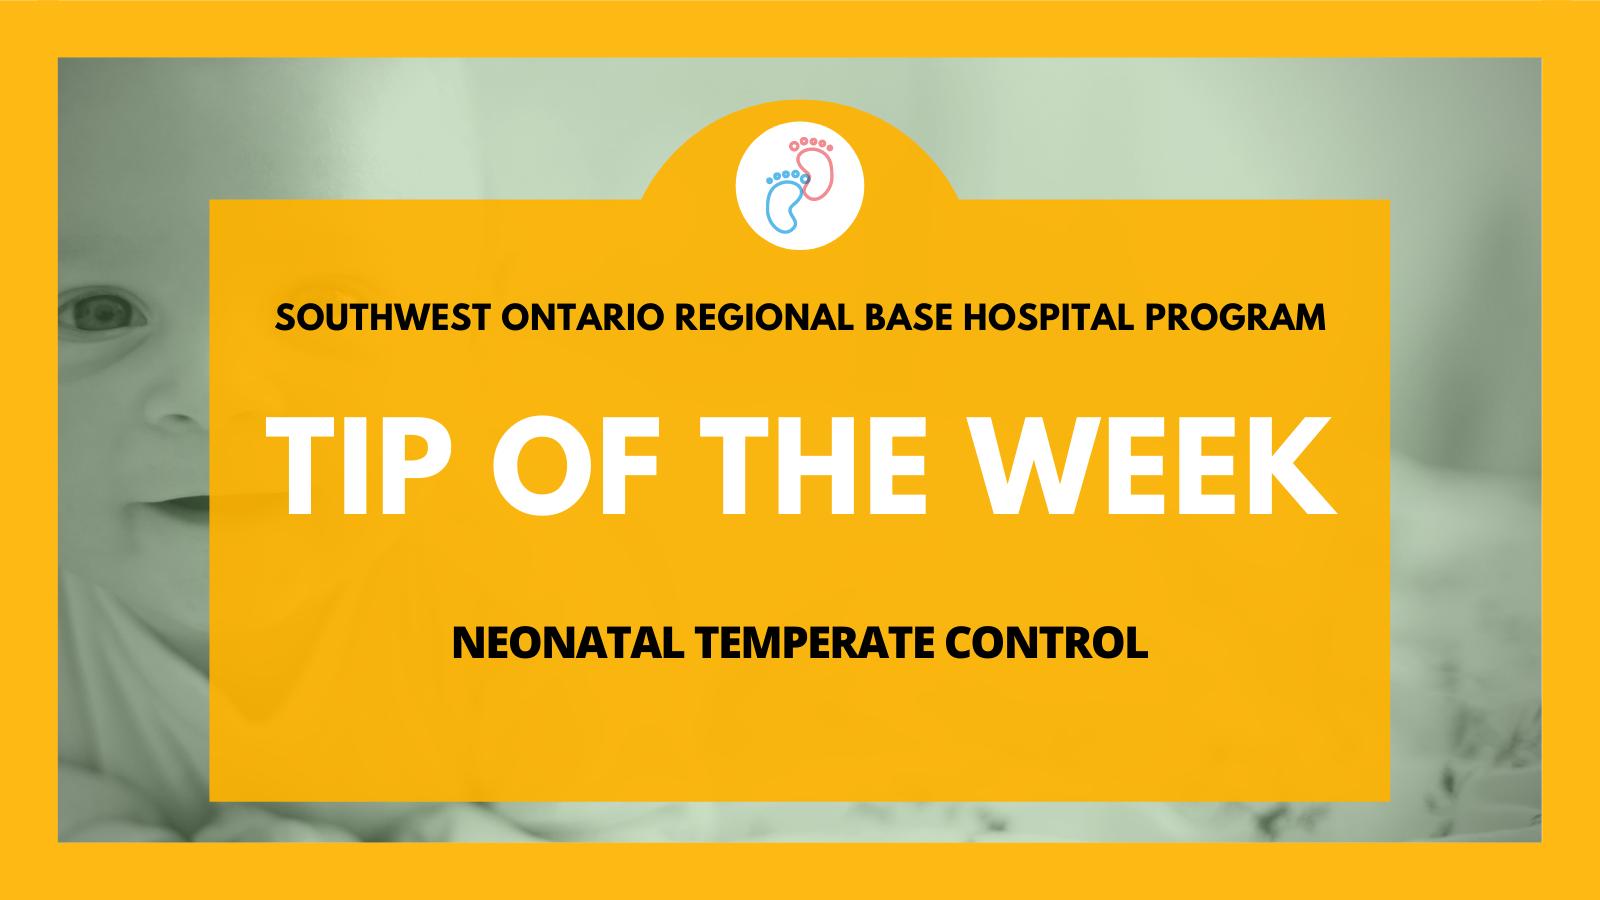 Neonatal Temperate Control